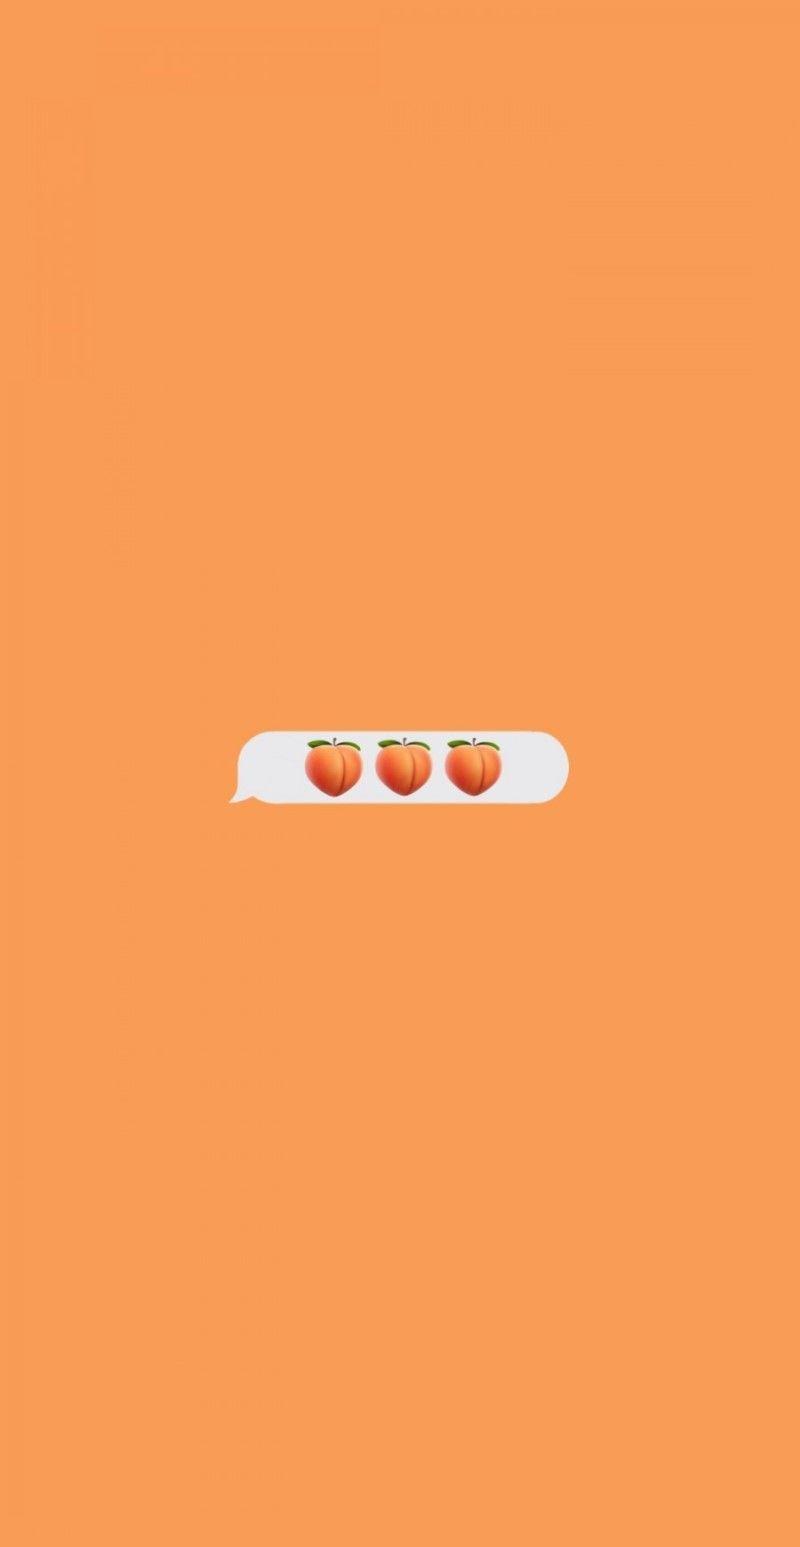 Orange Background Foundonweheartit Iphonebackground Phonebackground Iphonewallpaper Wallpaper Cute Fall Wallpaper Iphone Wallpaper Orange Orange Wallpaper